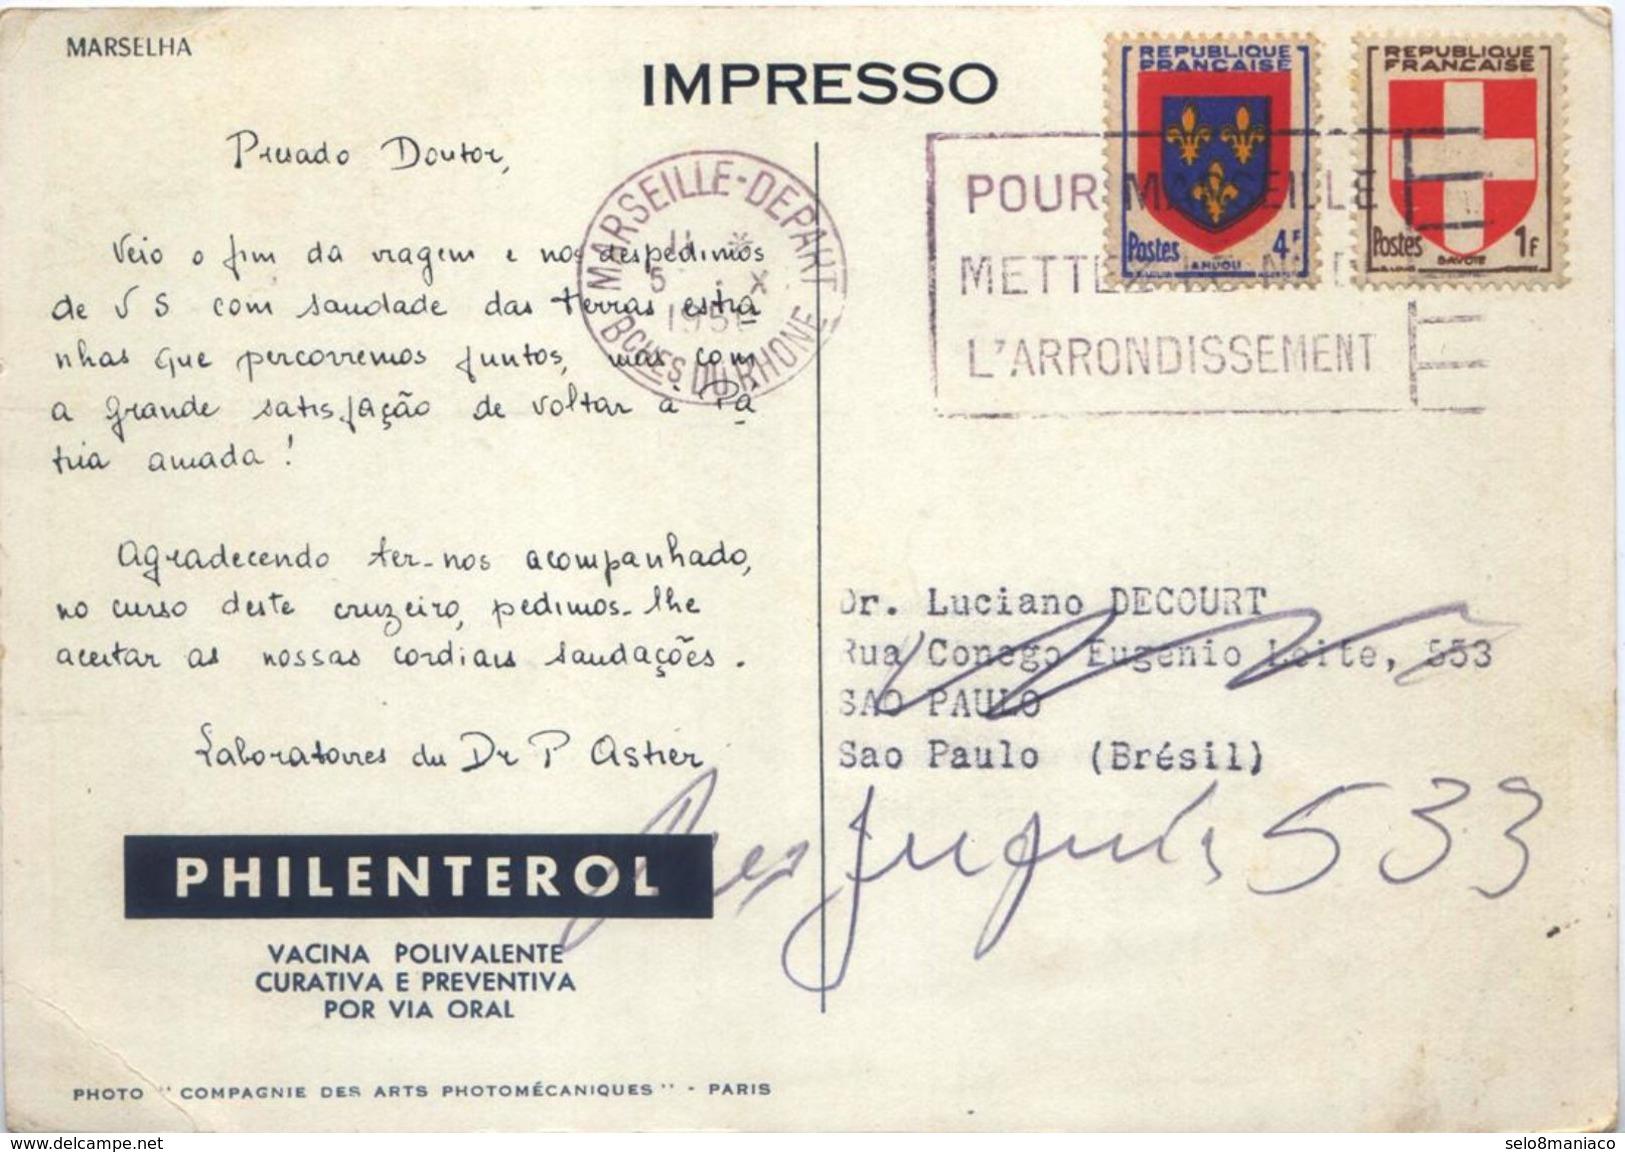 X1420-France-Hello Doctor Postcard From Marseille To São Paulo, Brazil-1950 - France